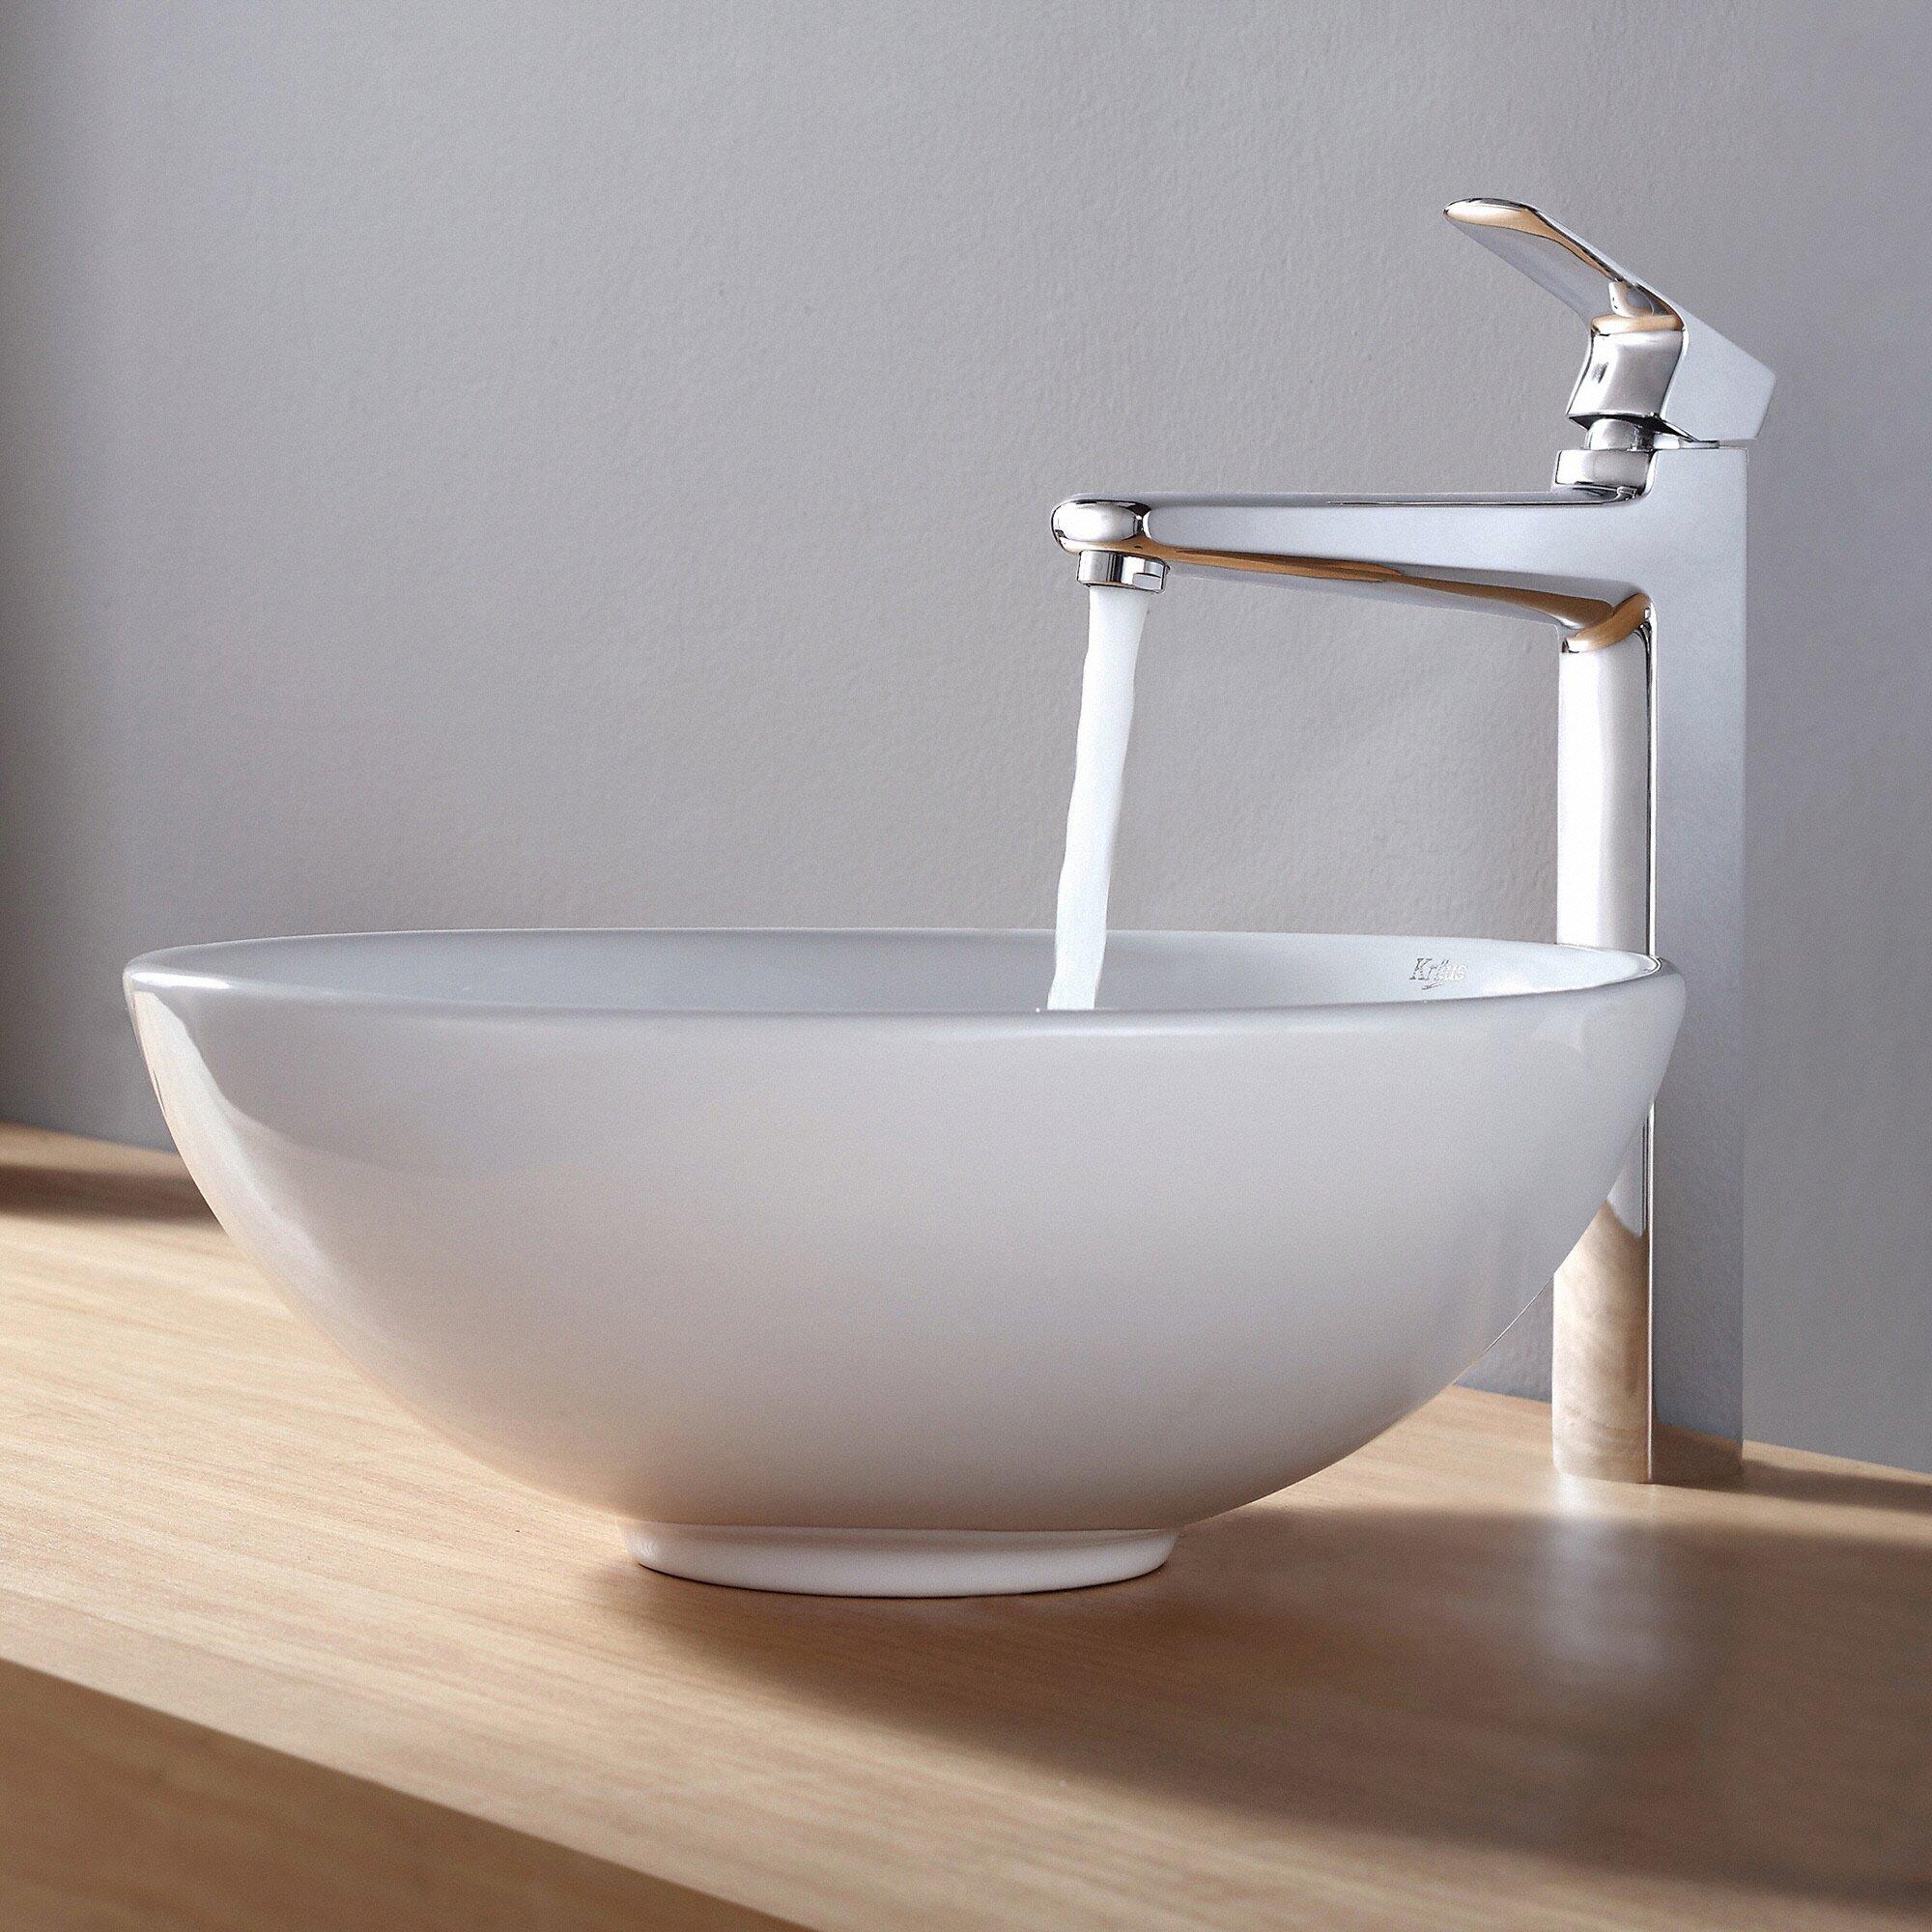 ... Fixtures ... Vessel Bathroom Sinks Kraus Part #: KCV-141 SKU: KUS1328